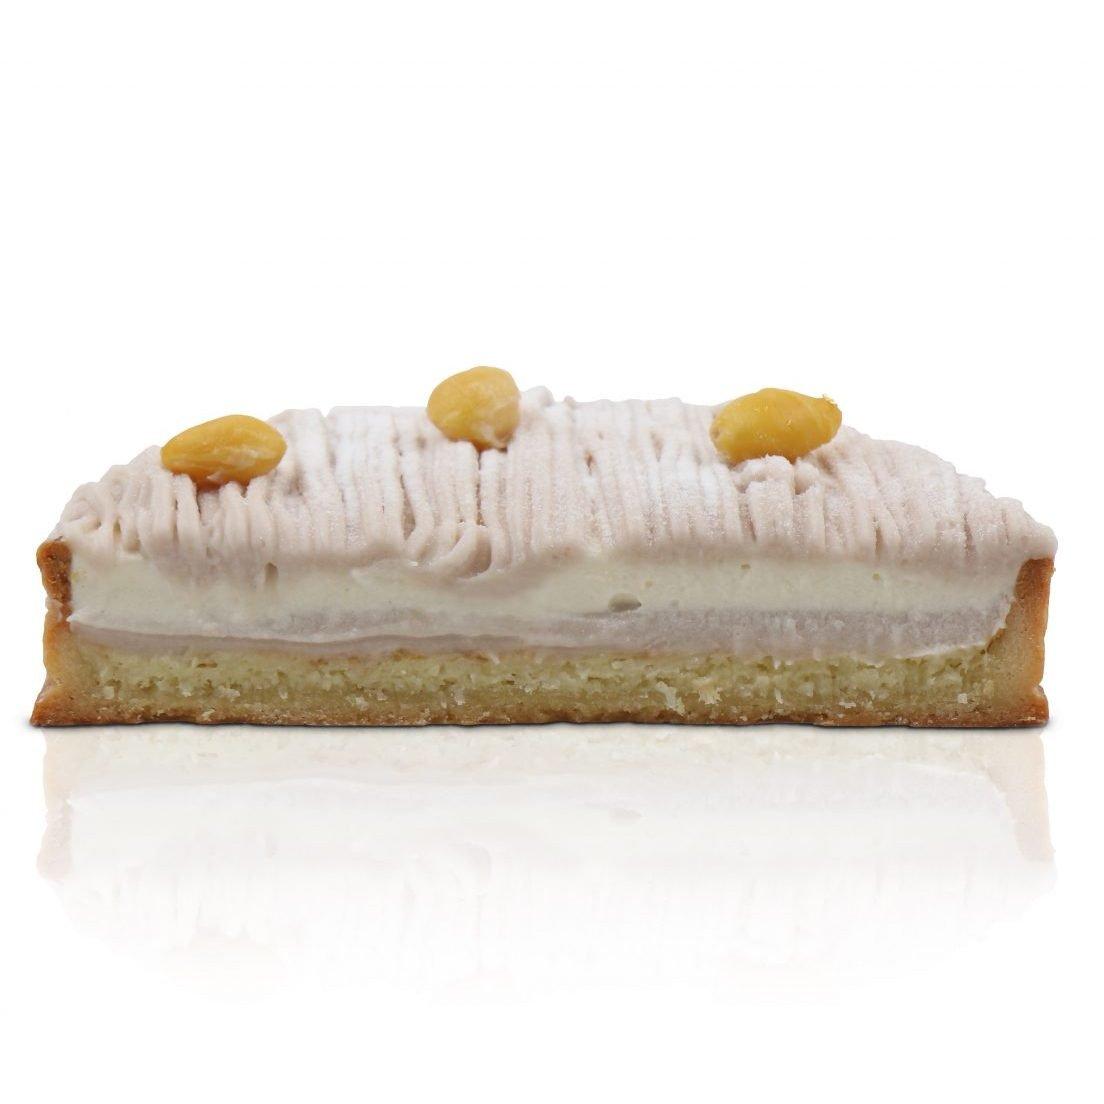 Orh blanc tart 2